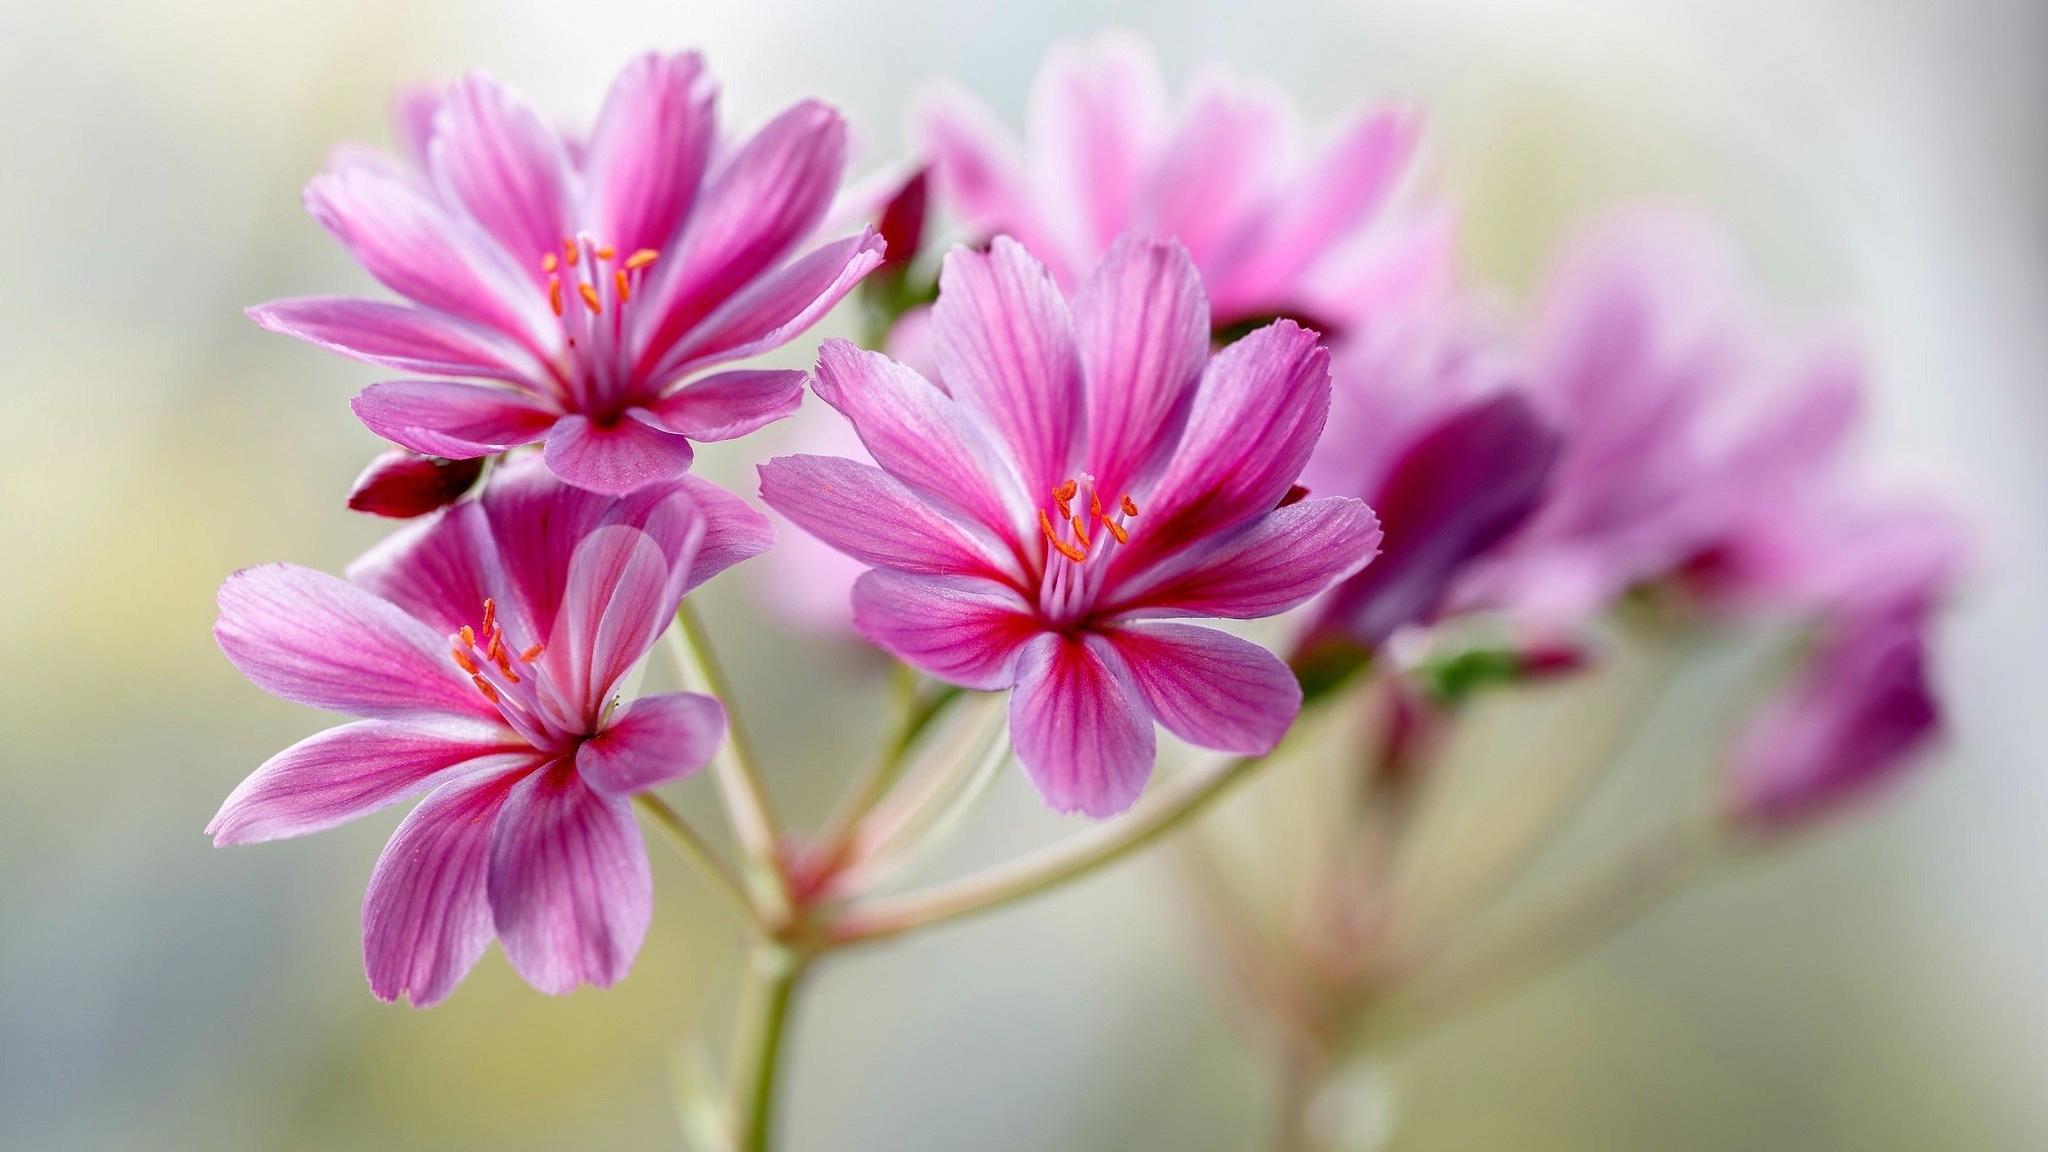 Download 2048x1152 Wallpaper Blur Portrait Light Pink Flowers